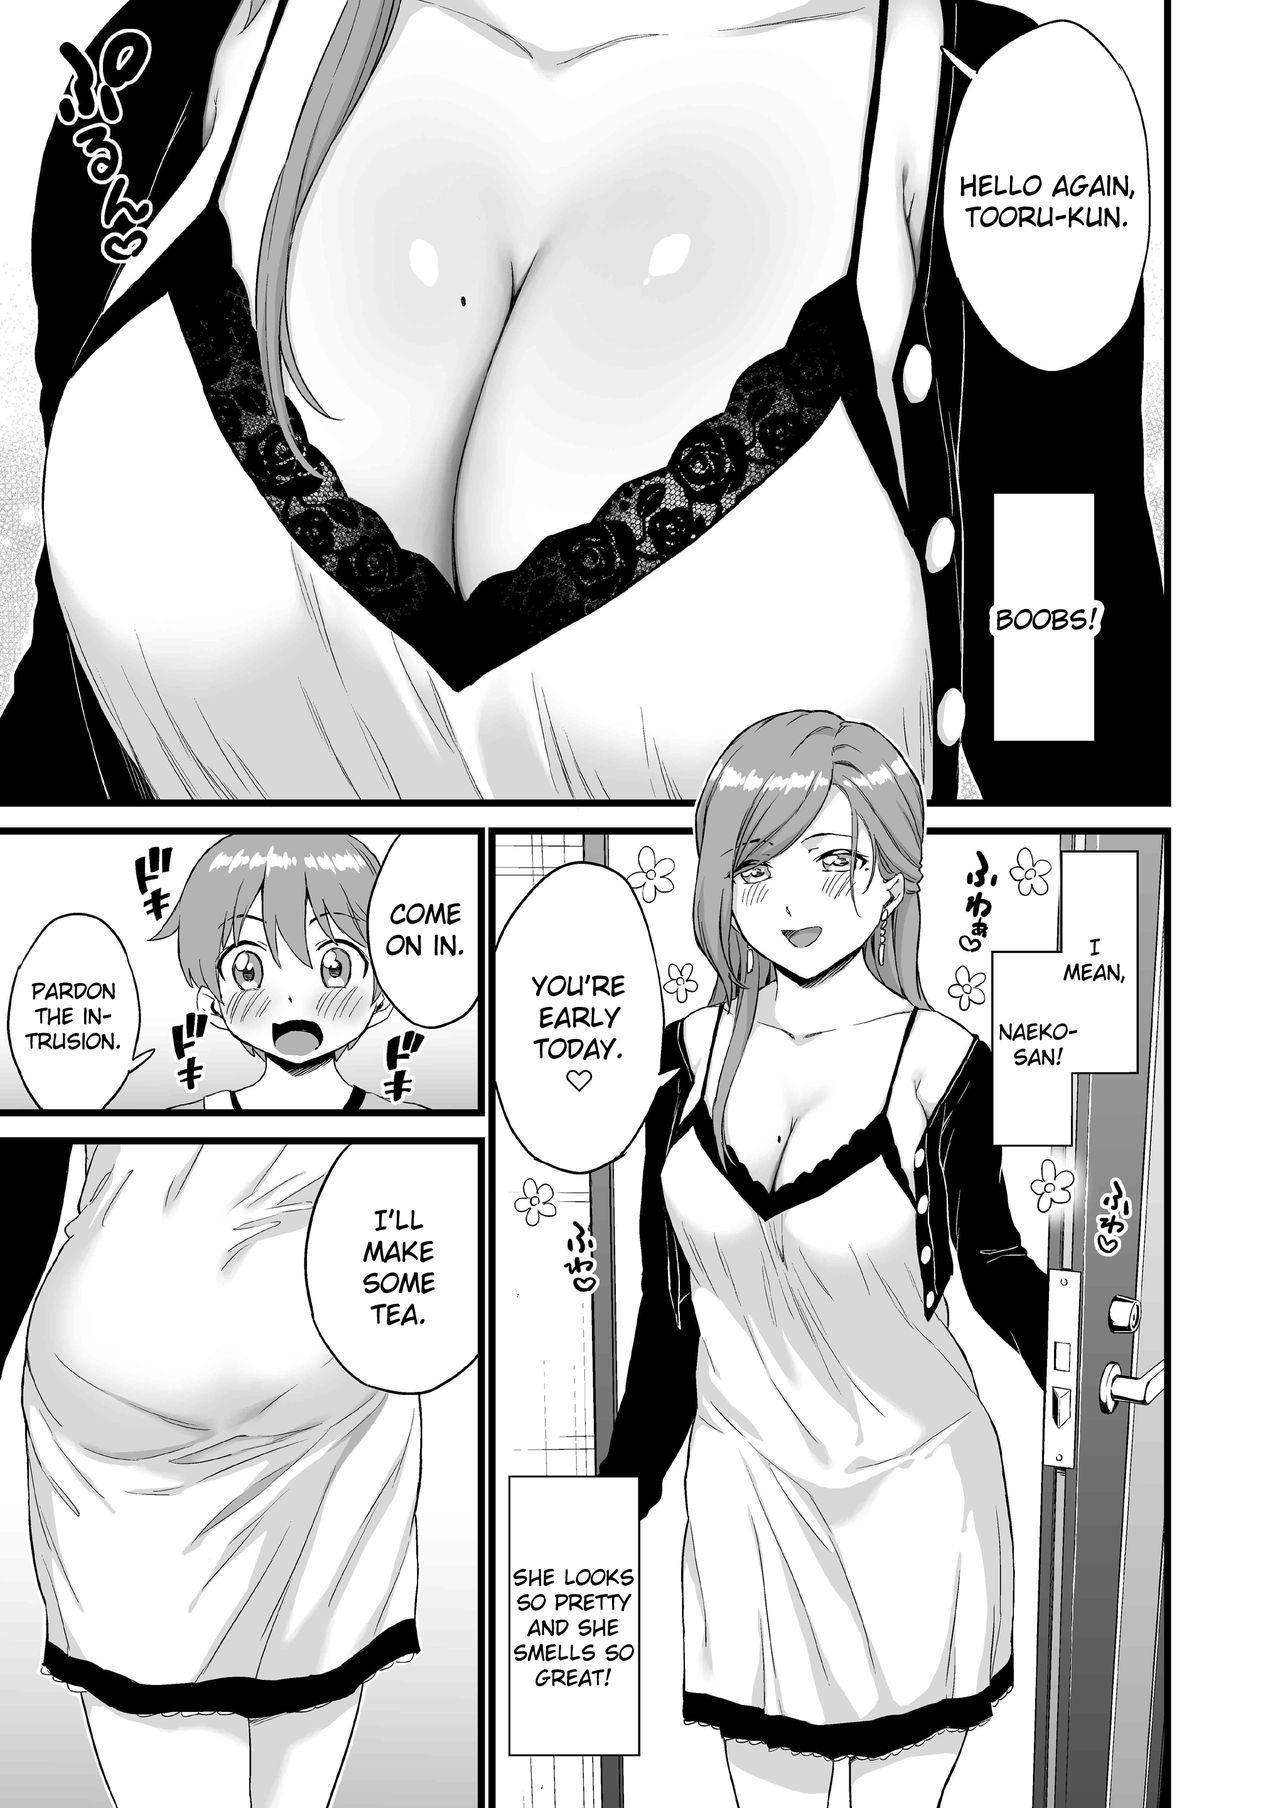 Oppai na Natsuyasumi 3 | The Summer Break of Boobs 3 7